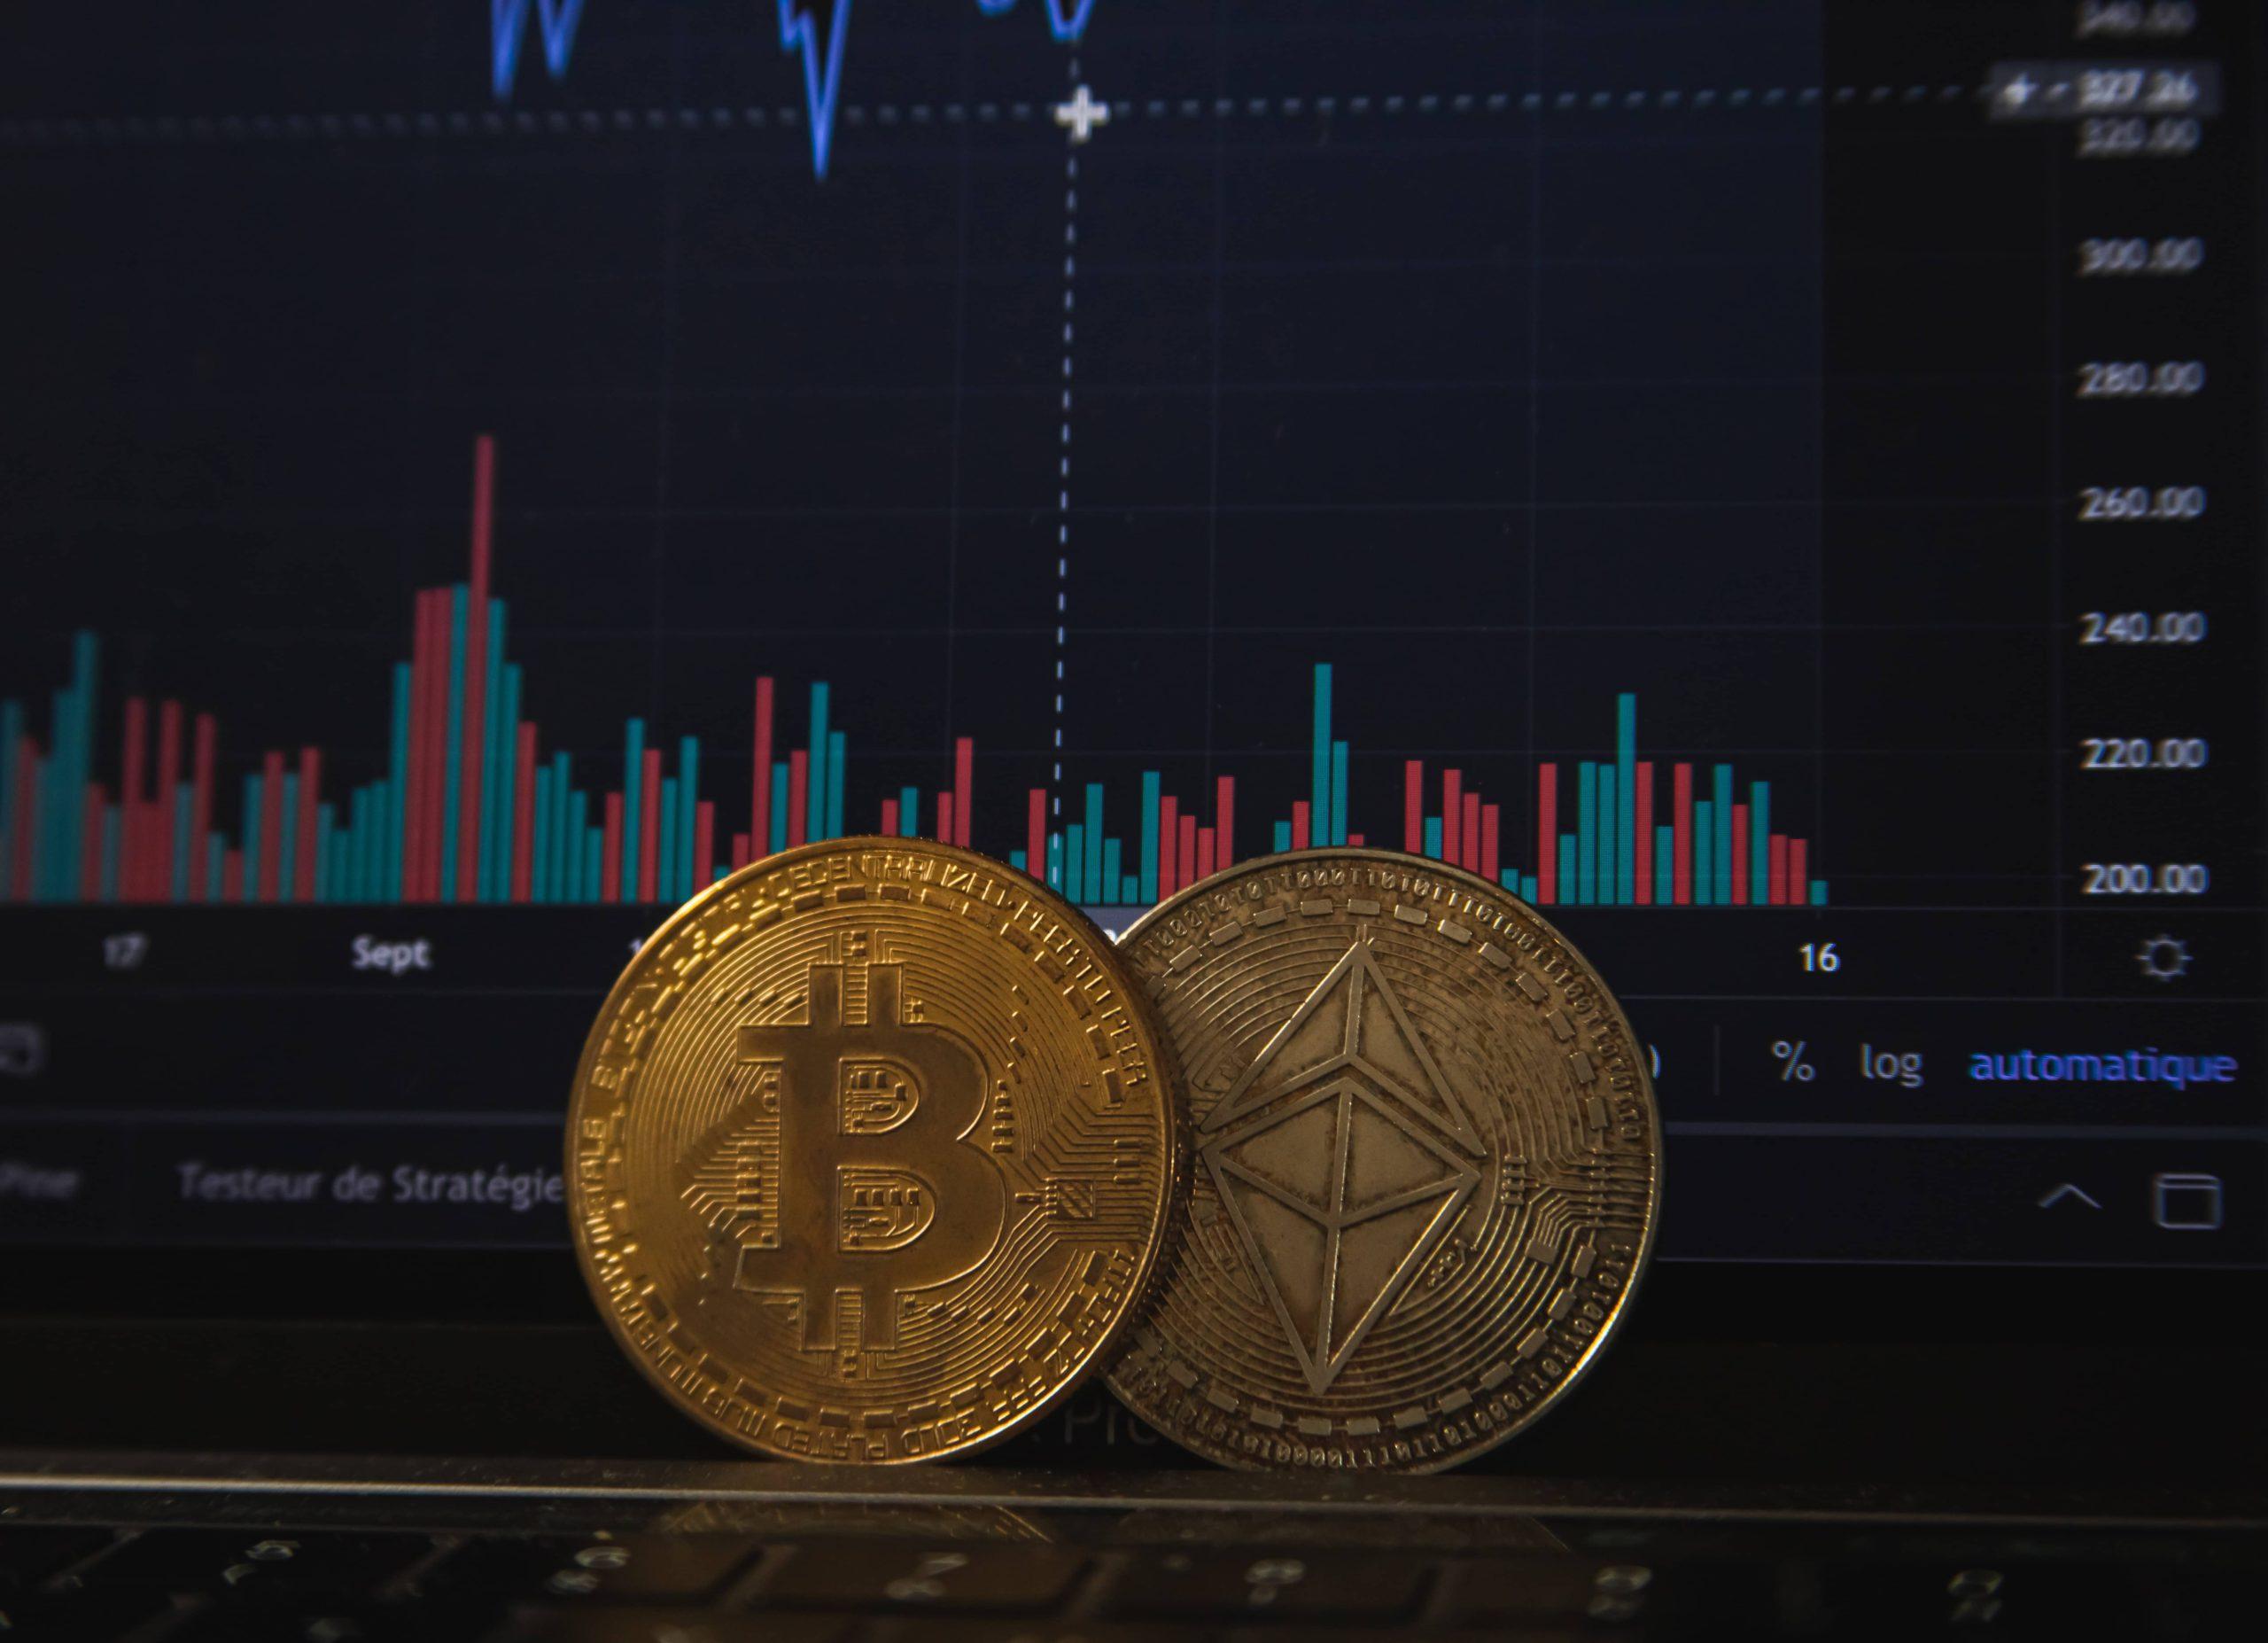 UXTO and Account Based Blockchains